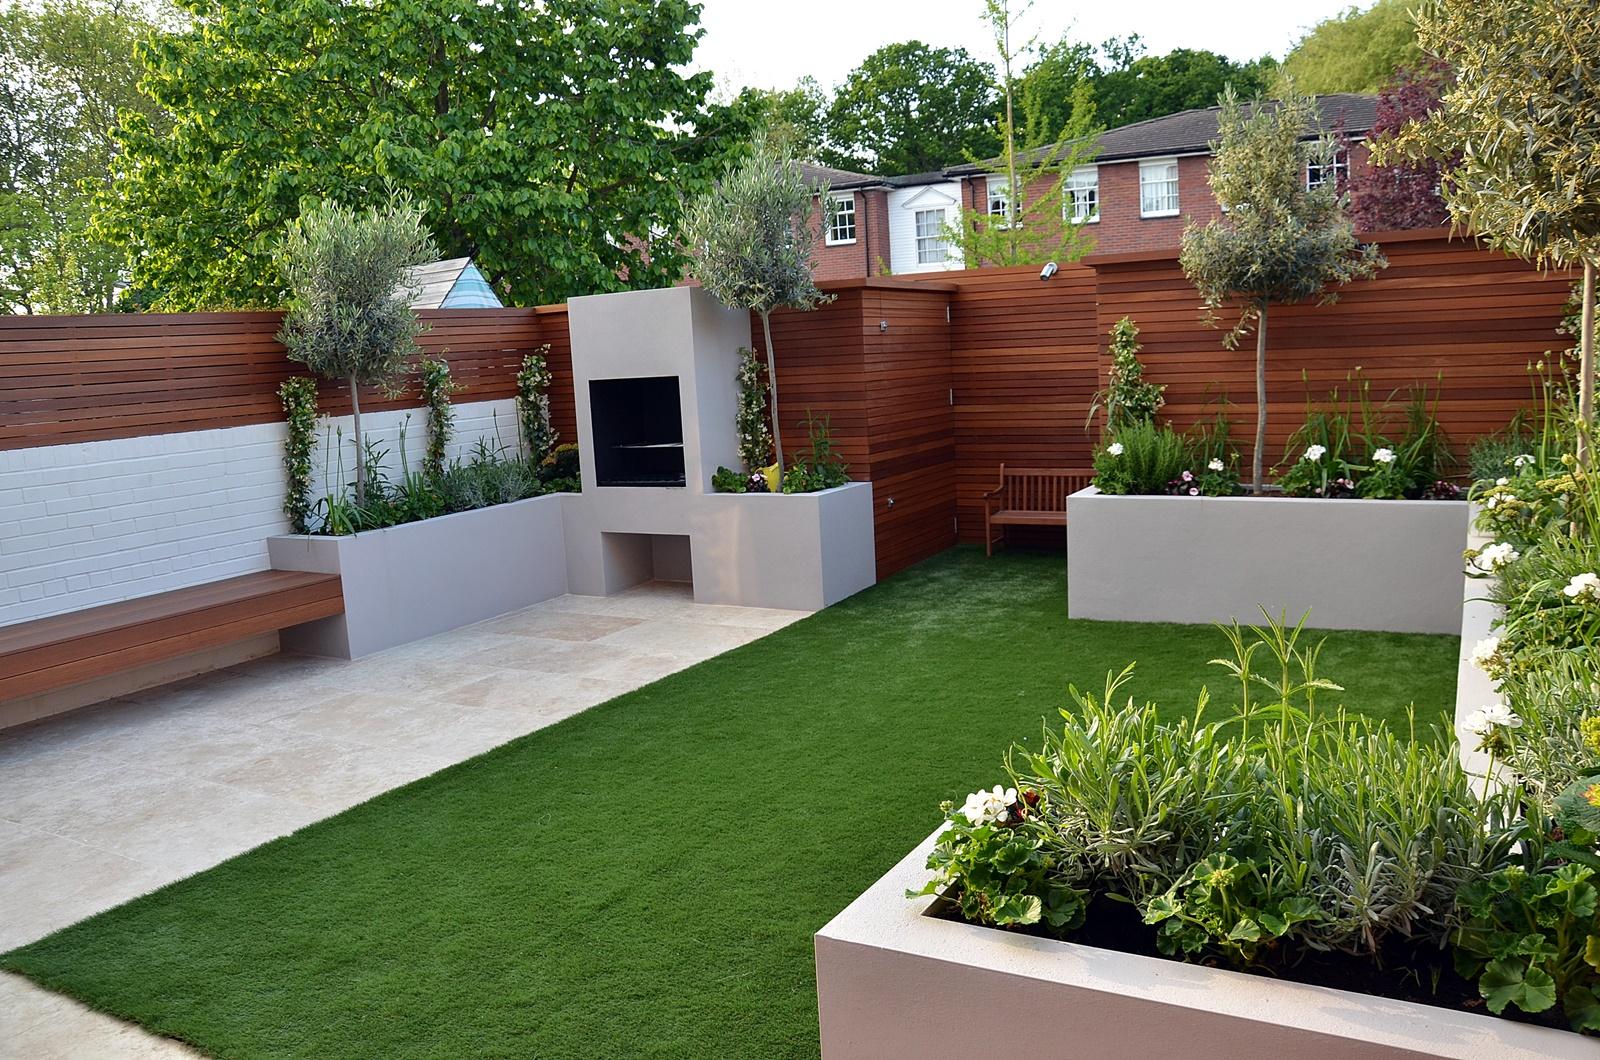 Modern garden design fulham chelsea clapham battersea - Design giardini ...